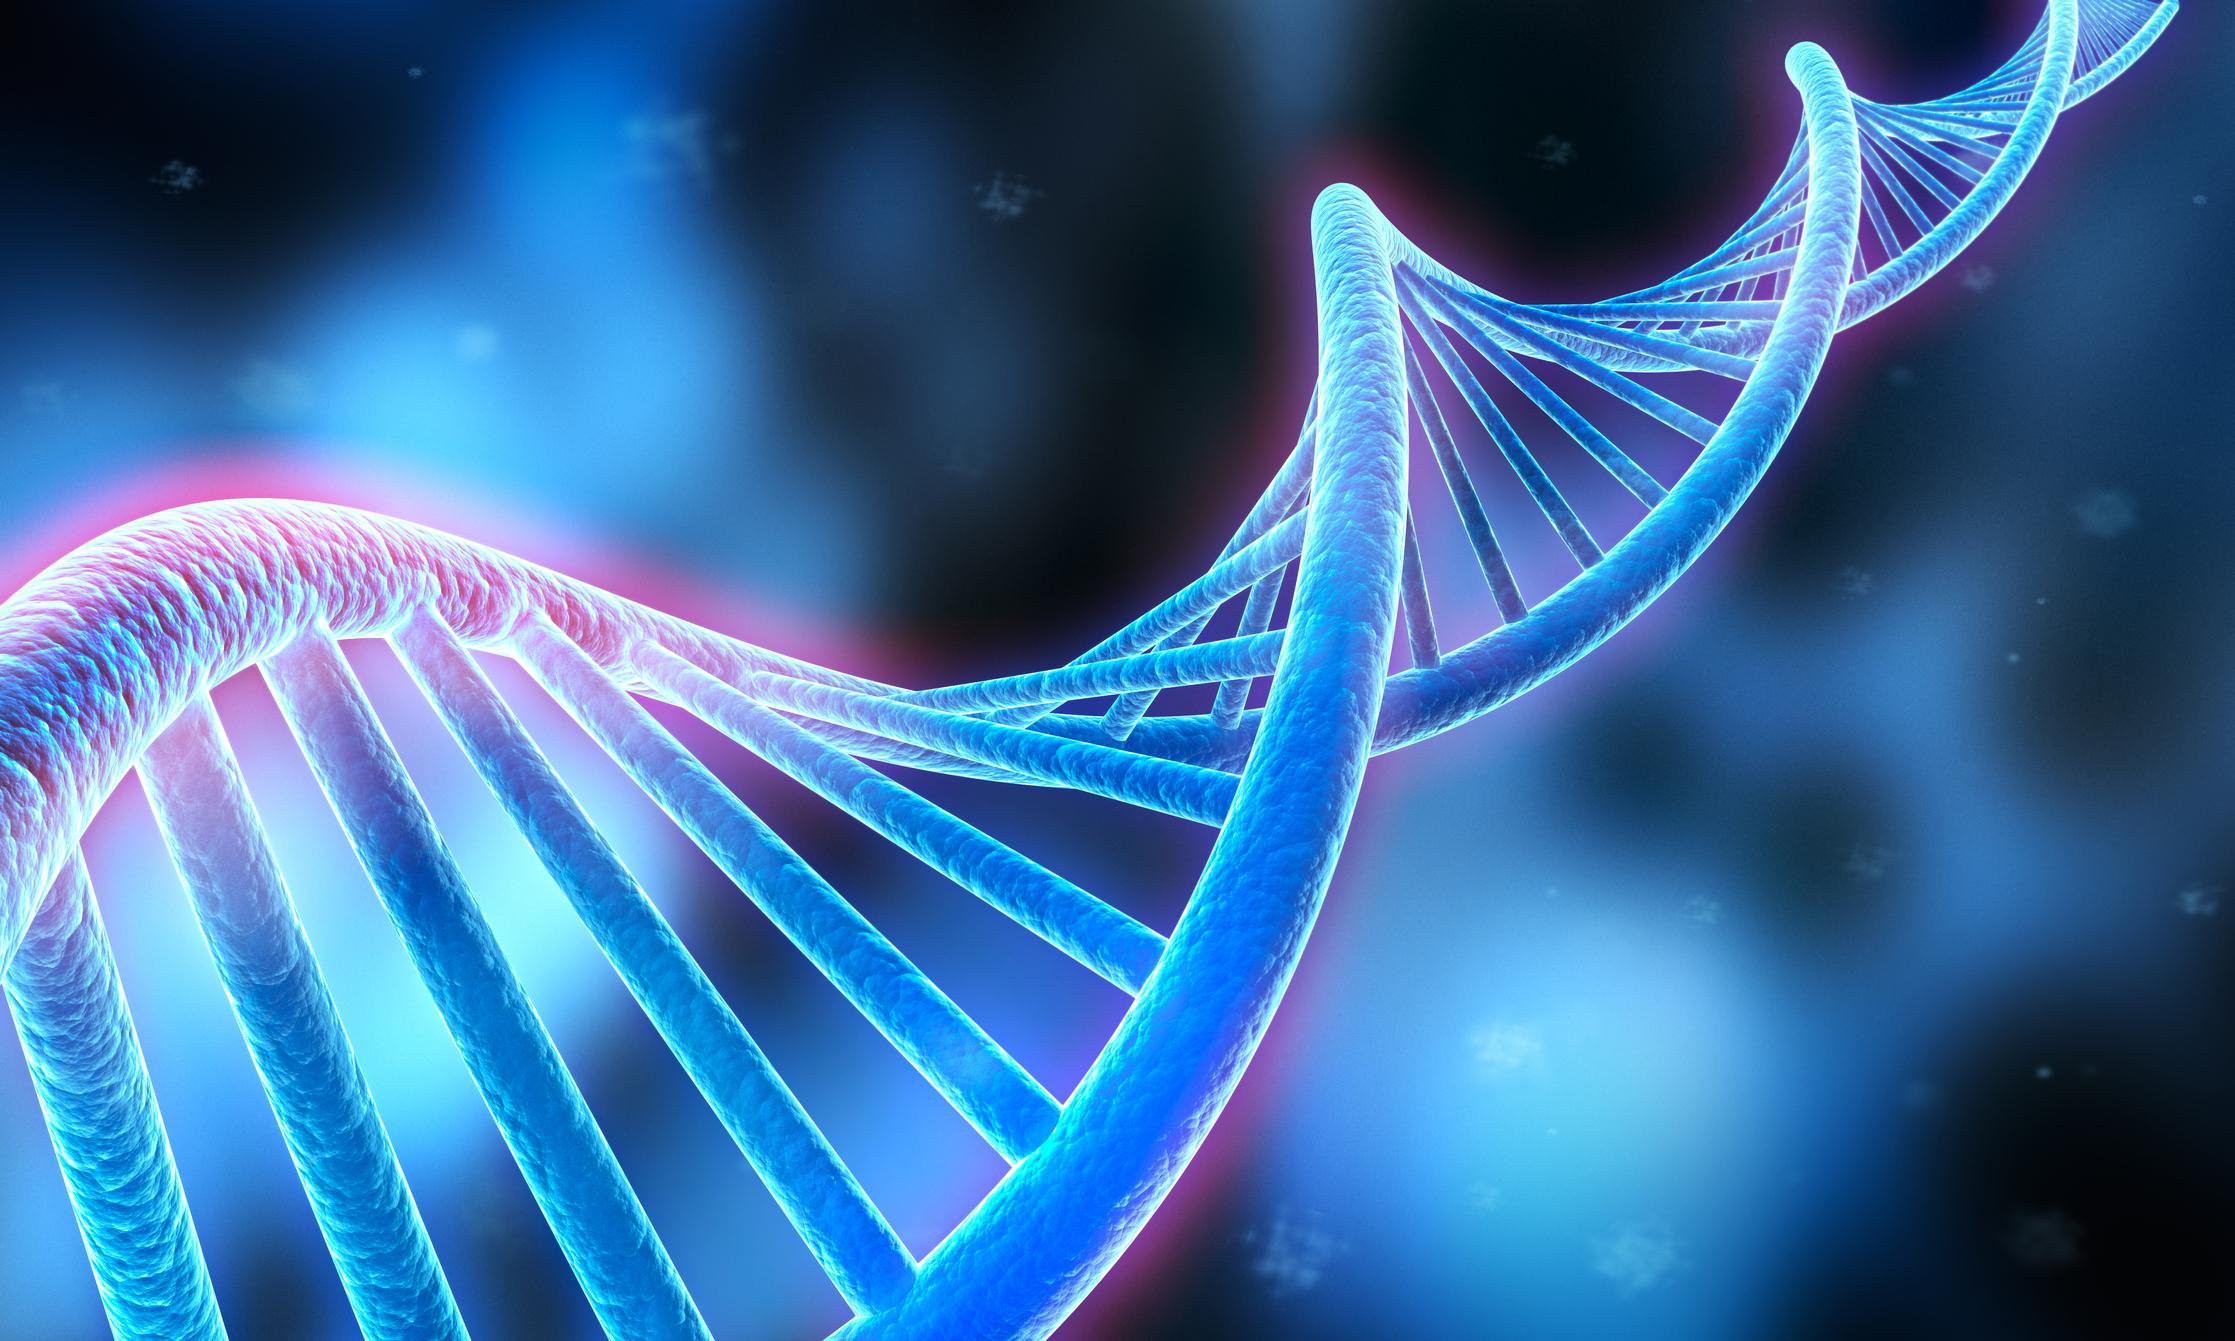 ADN – PROTECTION DES DONNÉES – BIG BROTHER ?